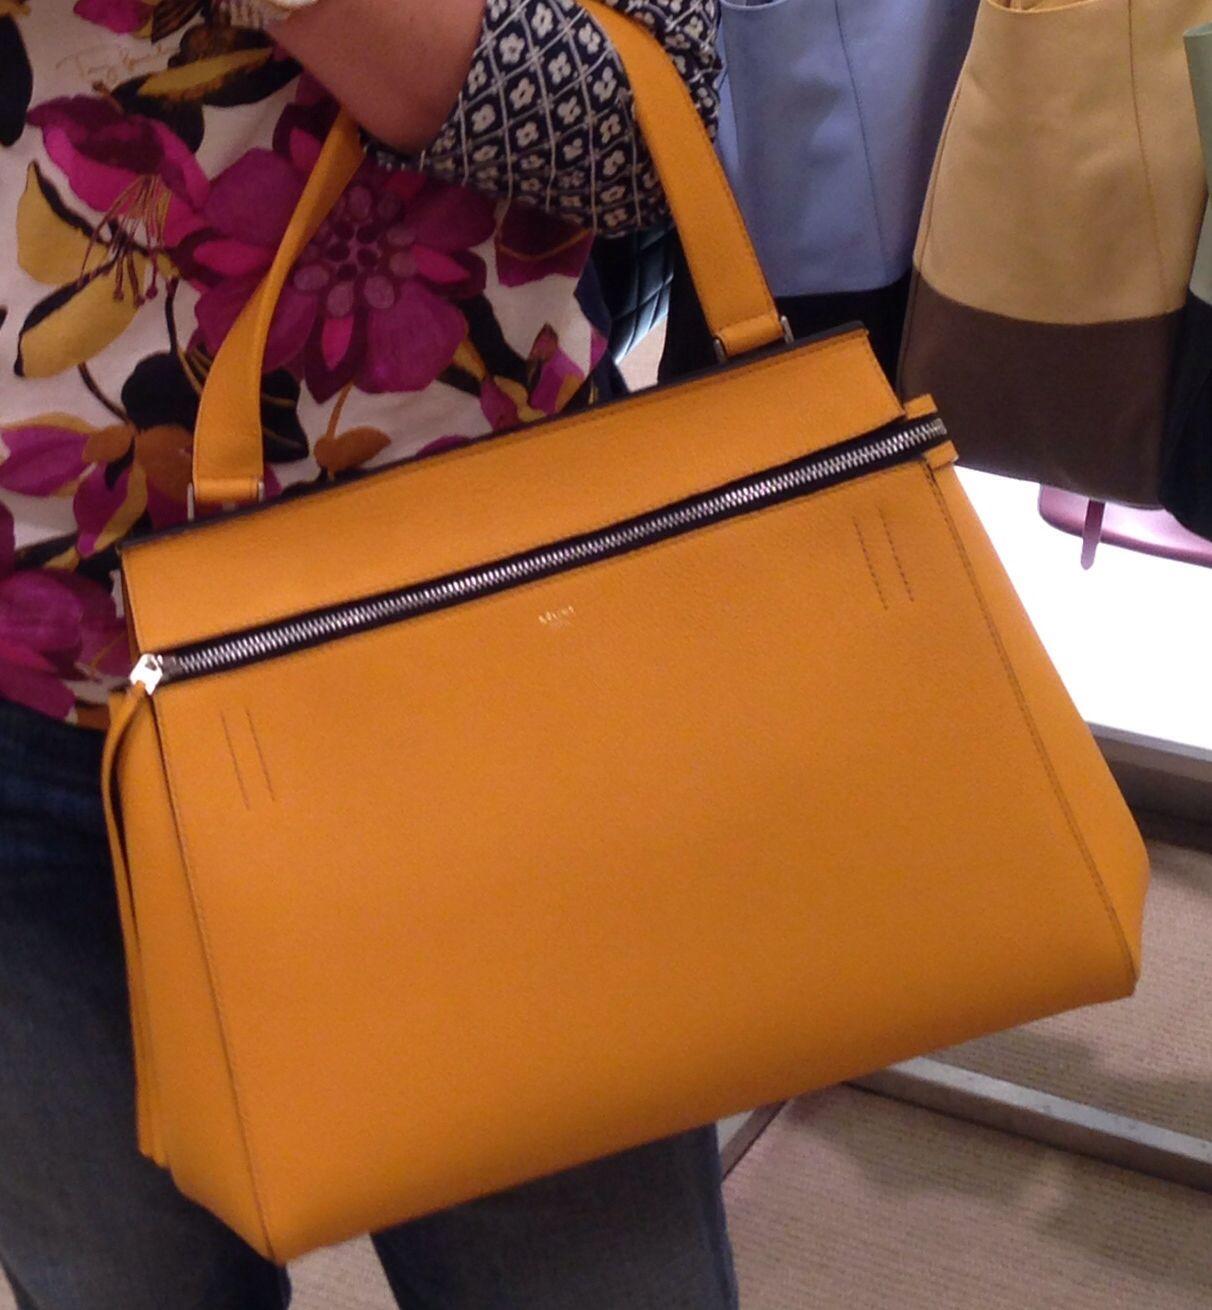 f63c0745c080 Celine Edge Bag in Mustard Yellow